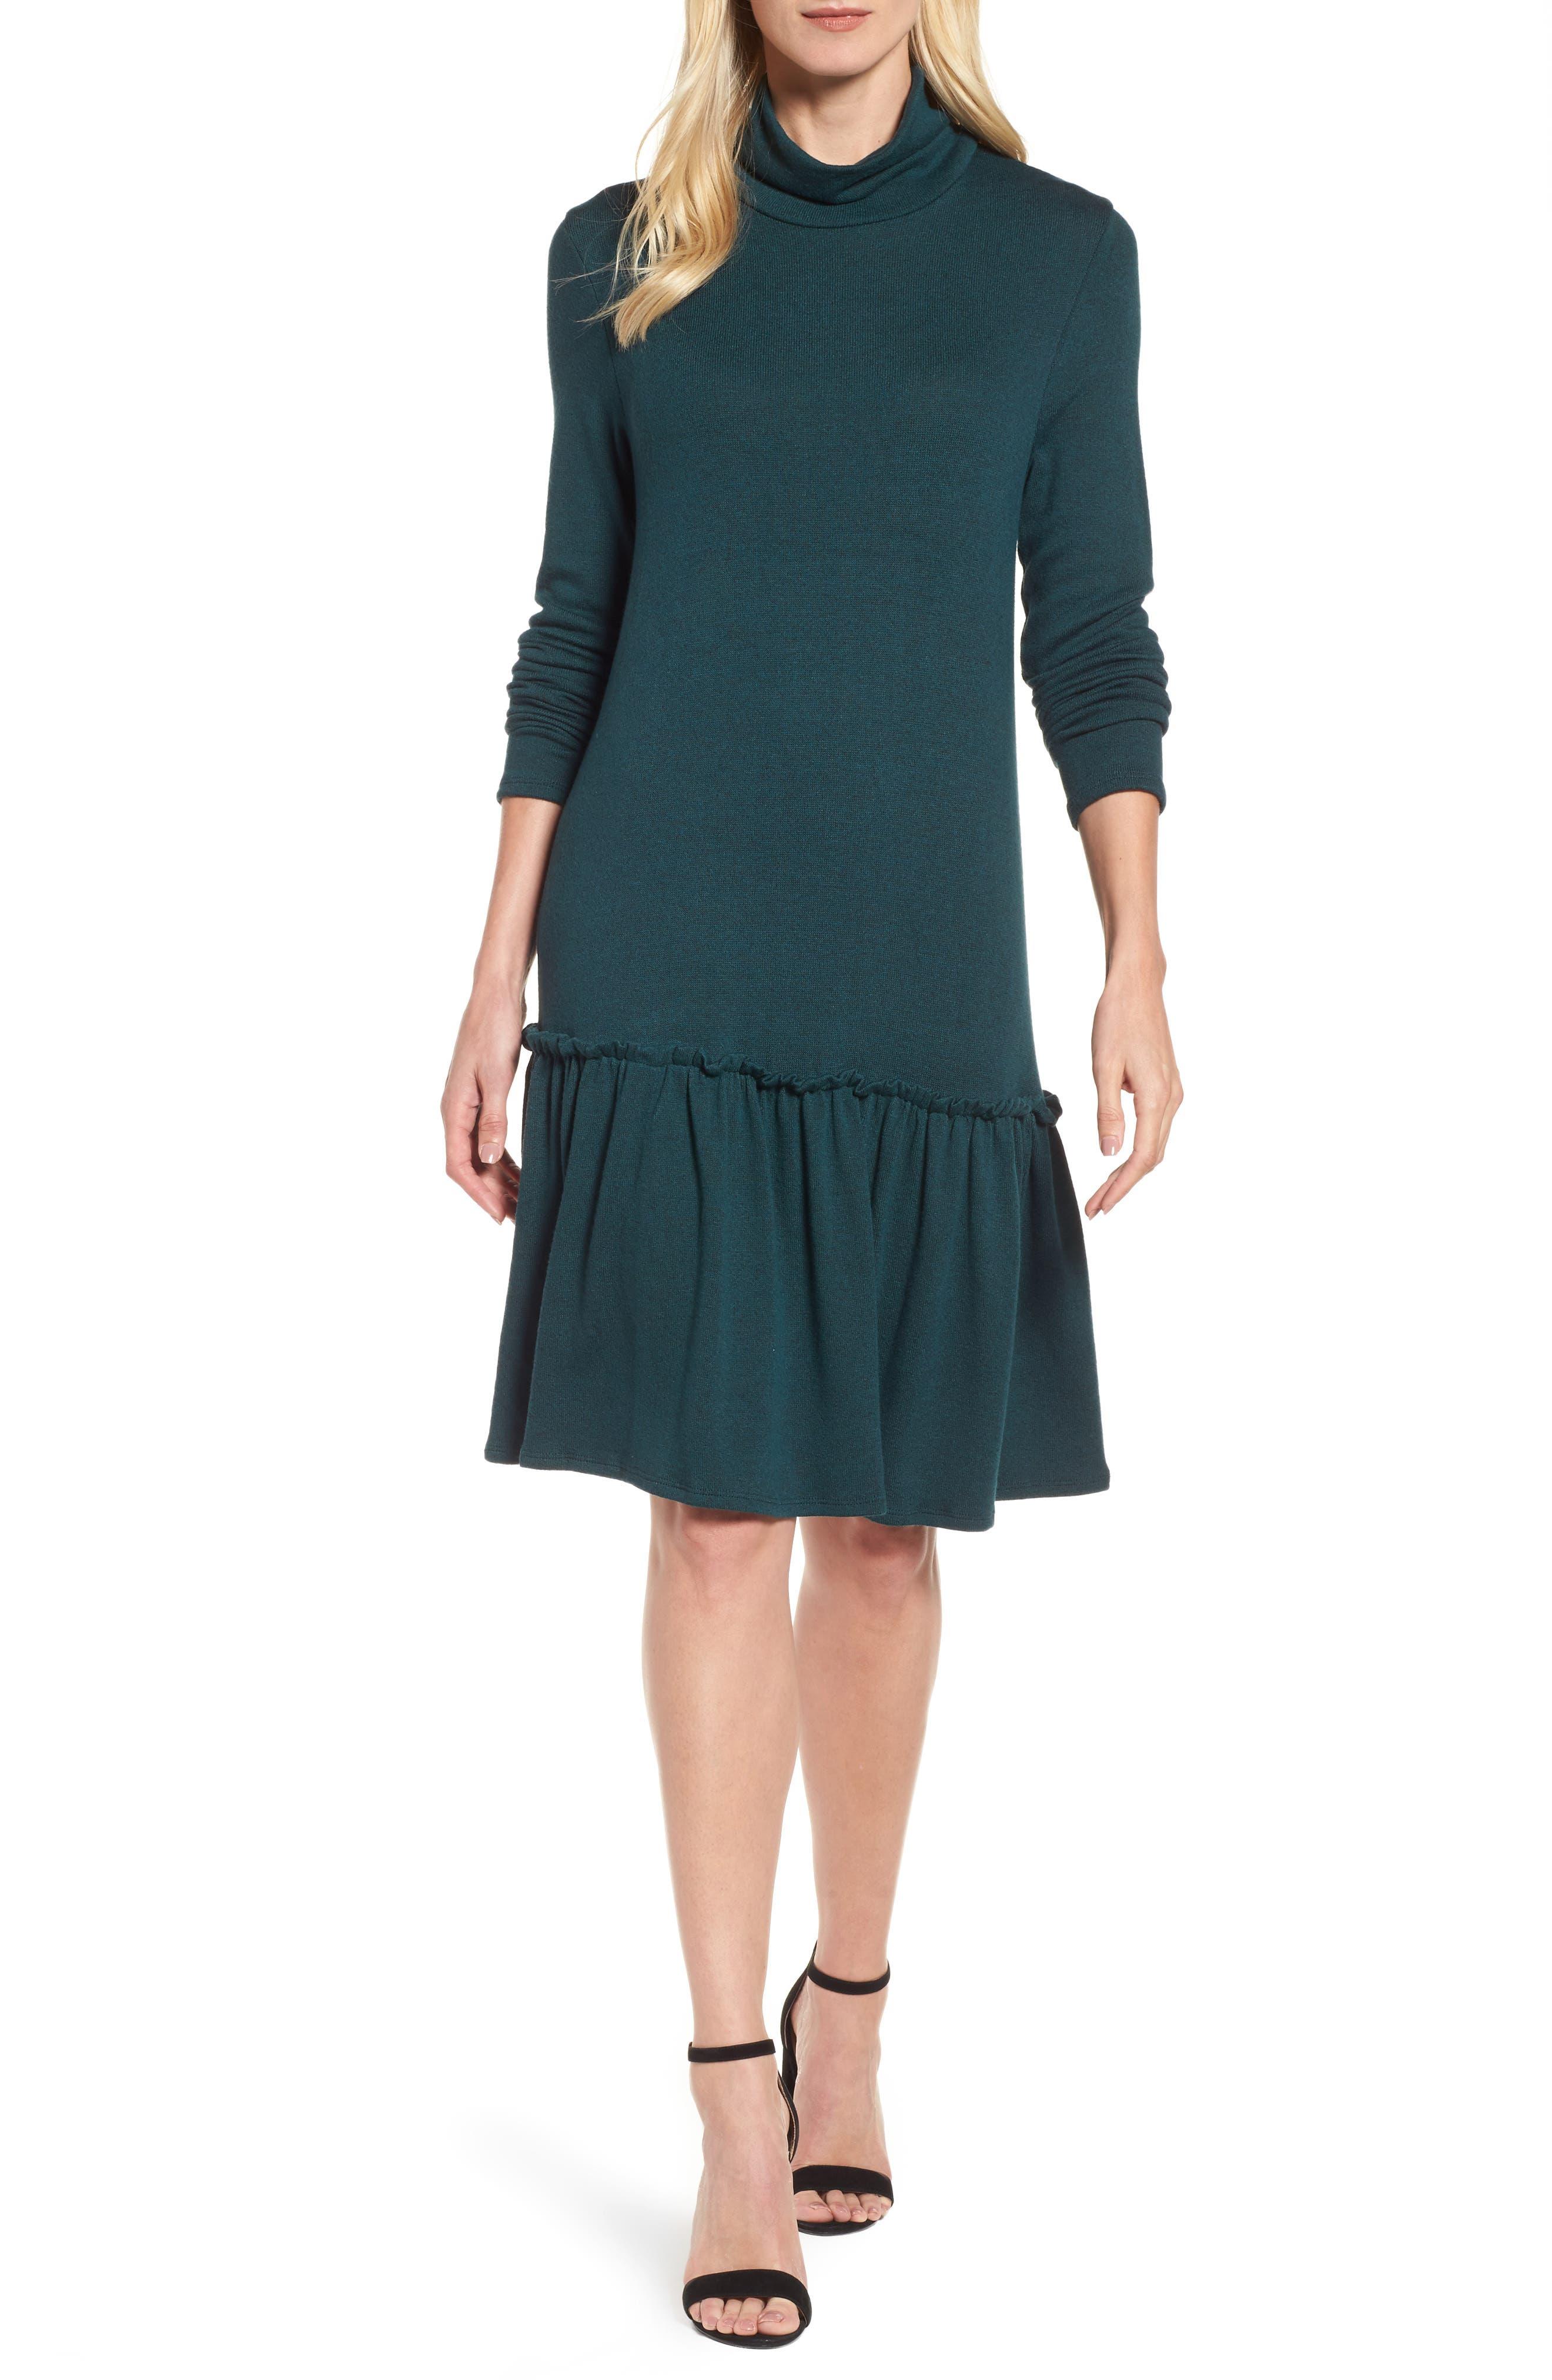 Ruffle Hem Turtleneck Dress,                         Main,                         color, Green